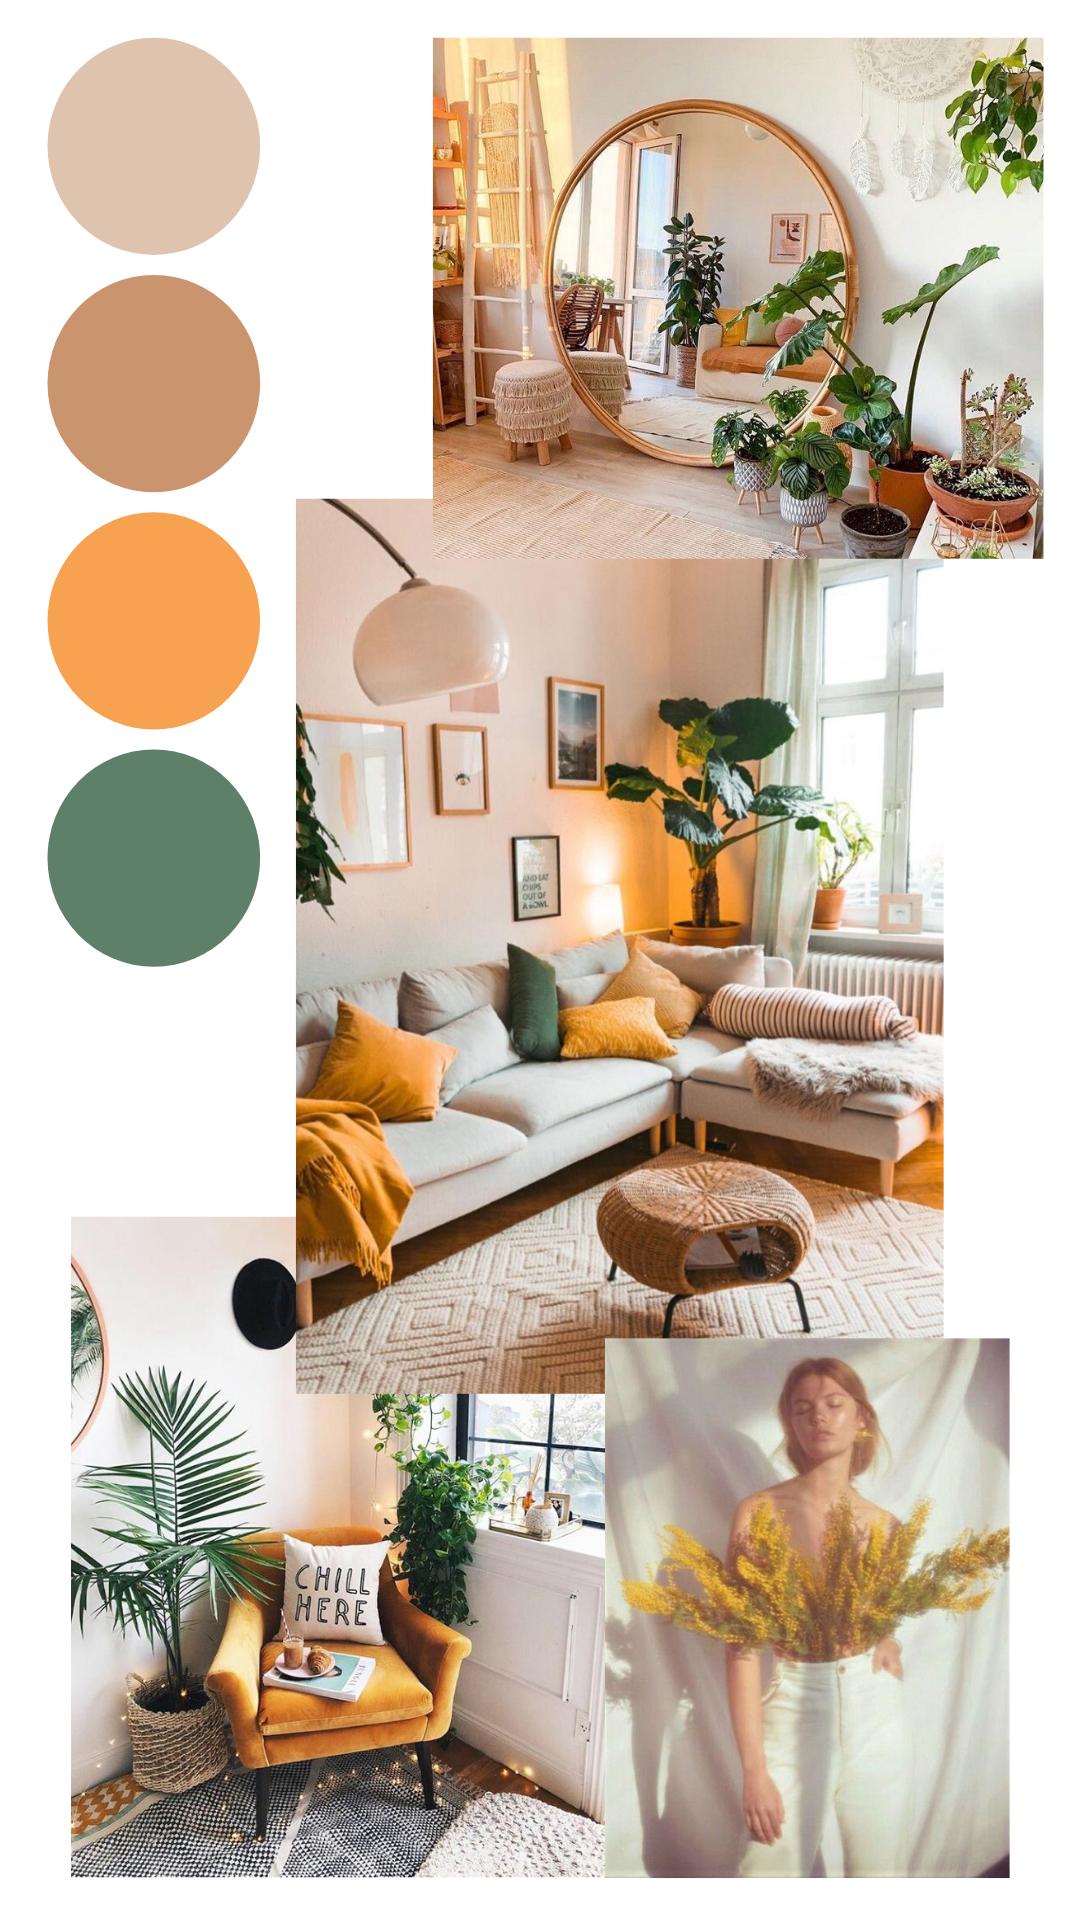 Combinaciones Con Verde Dekohi Living Room Decor Apartment Home Decor Bedroom Interior Design